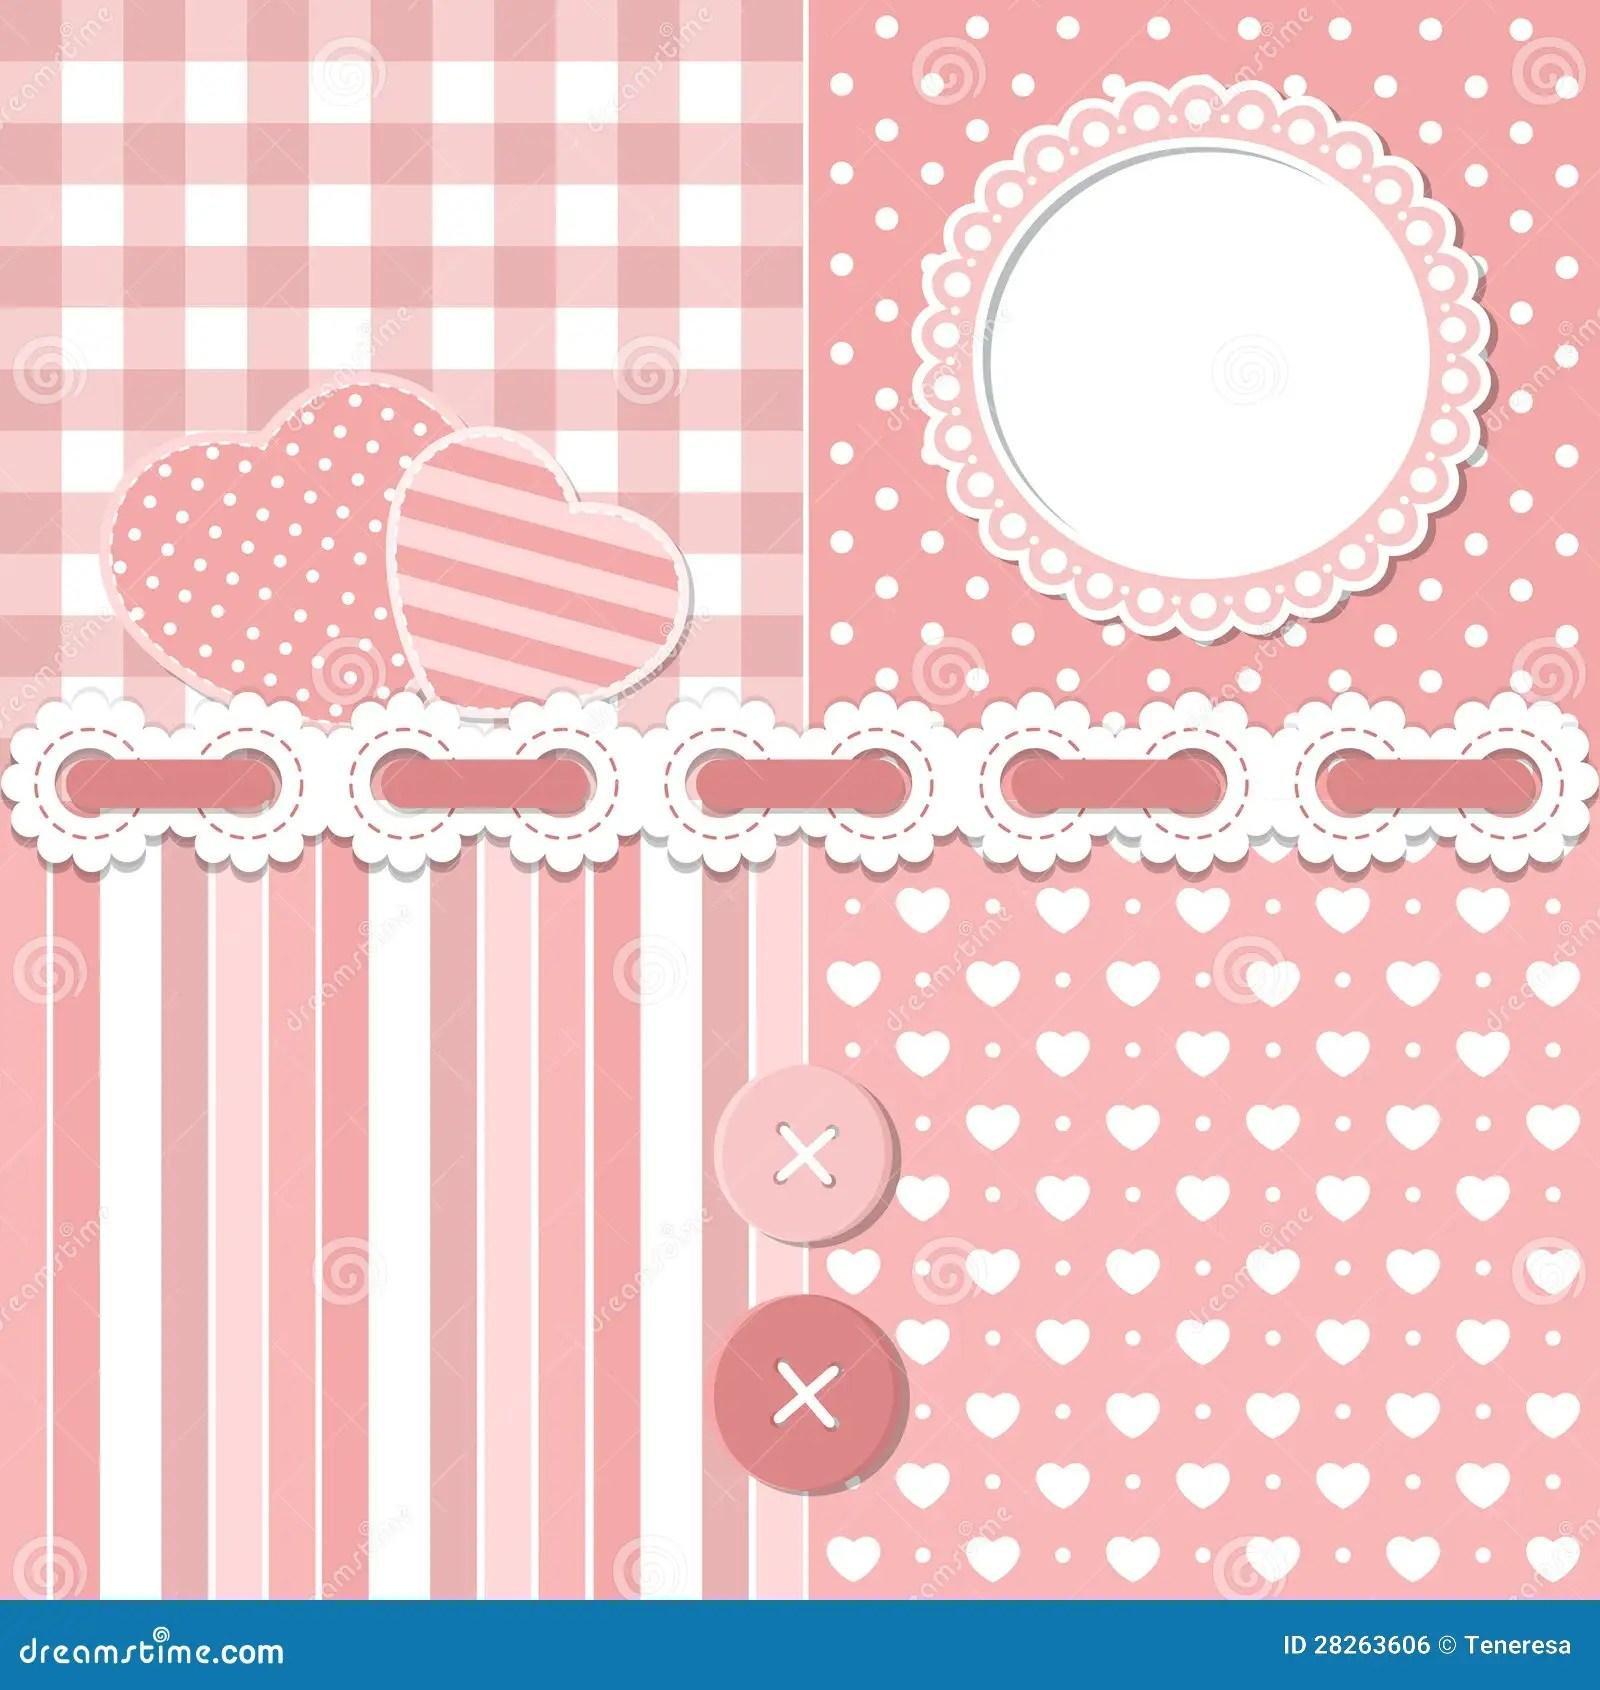 Cute Sweet Baby Hd Wallpaper Pink Scrapbook Set Royalty Free Stock Image Image 28263606